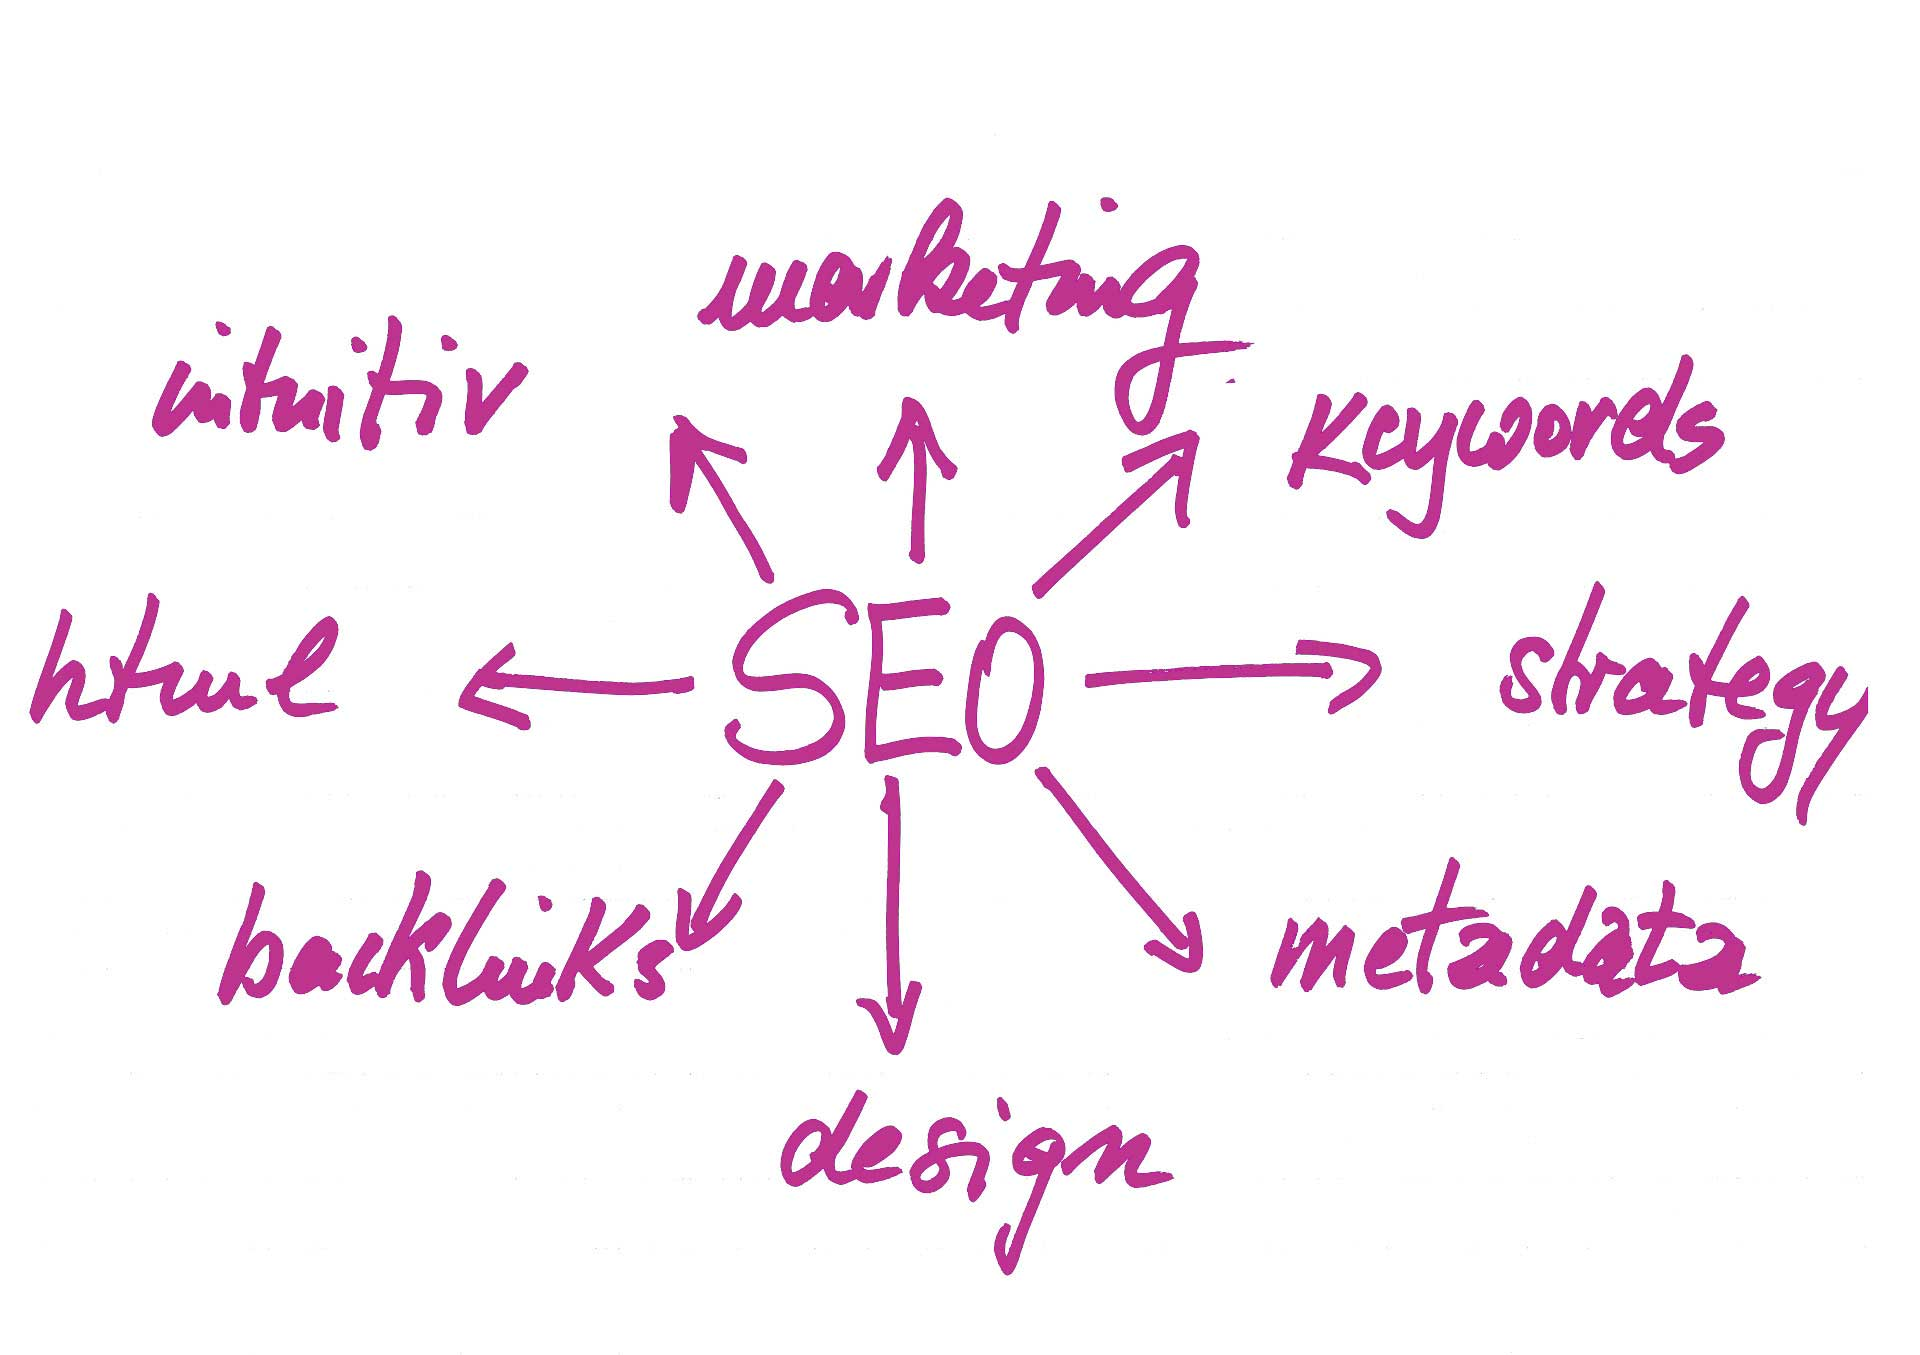 SEO Mindmap mit backlinks, design, metadata, strategy, keywords, marketing , intuitiv und html